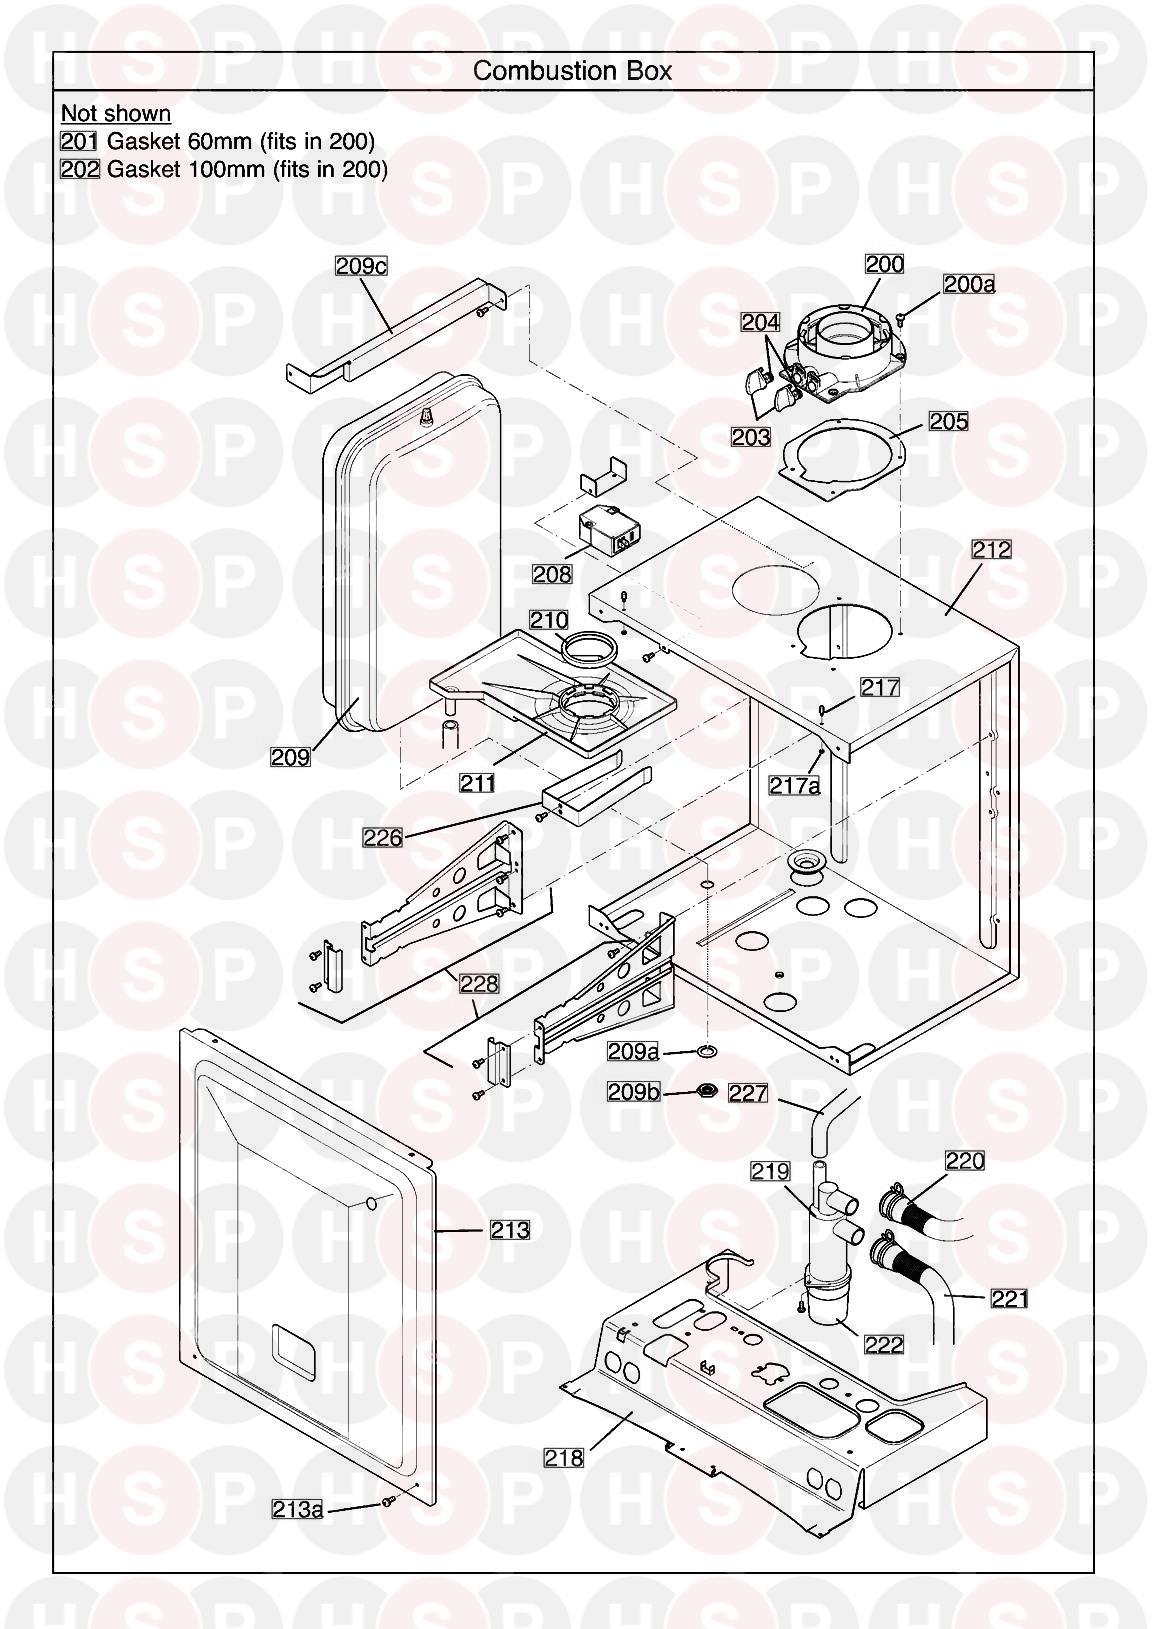 potterton titanium 28 combi erp serial no  ending in ac  combustion box  diagram